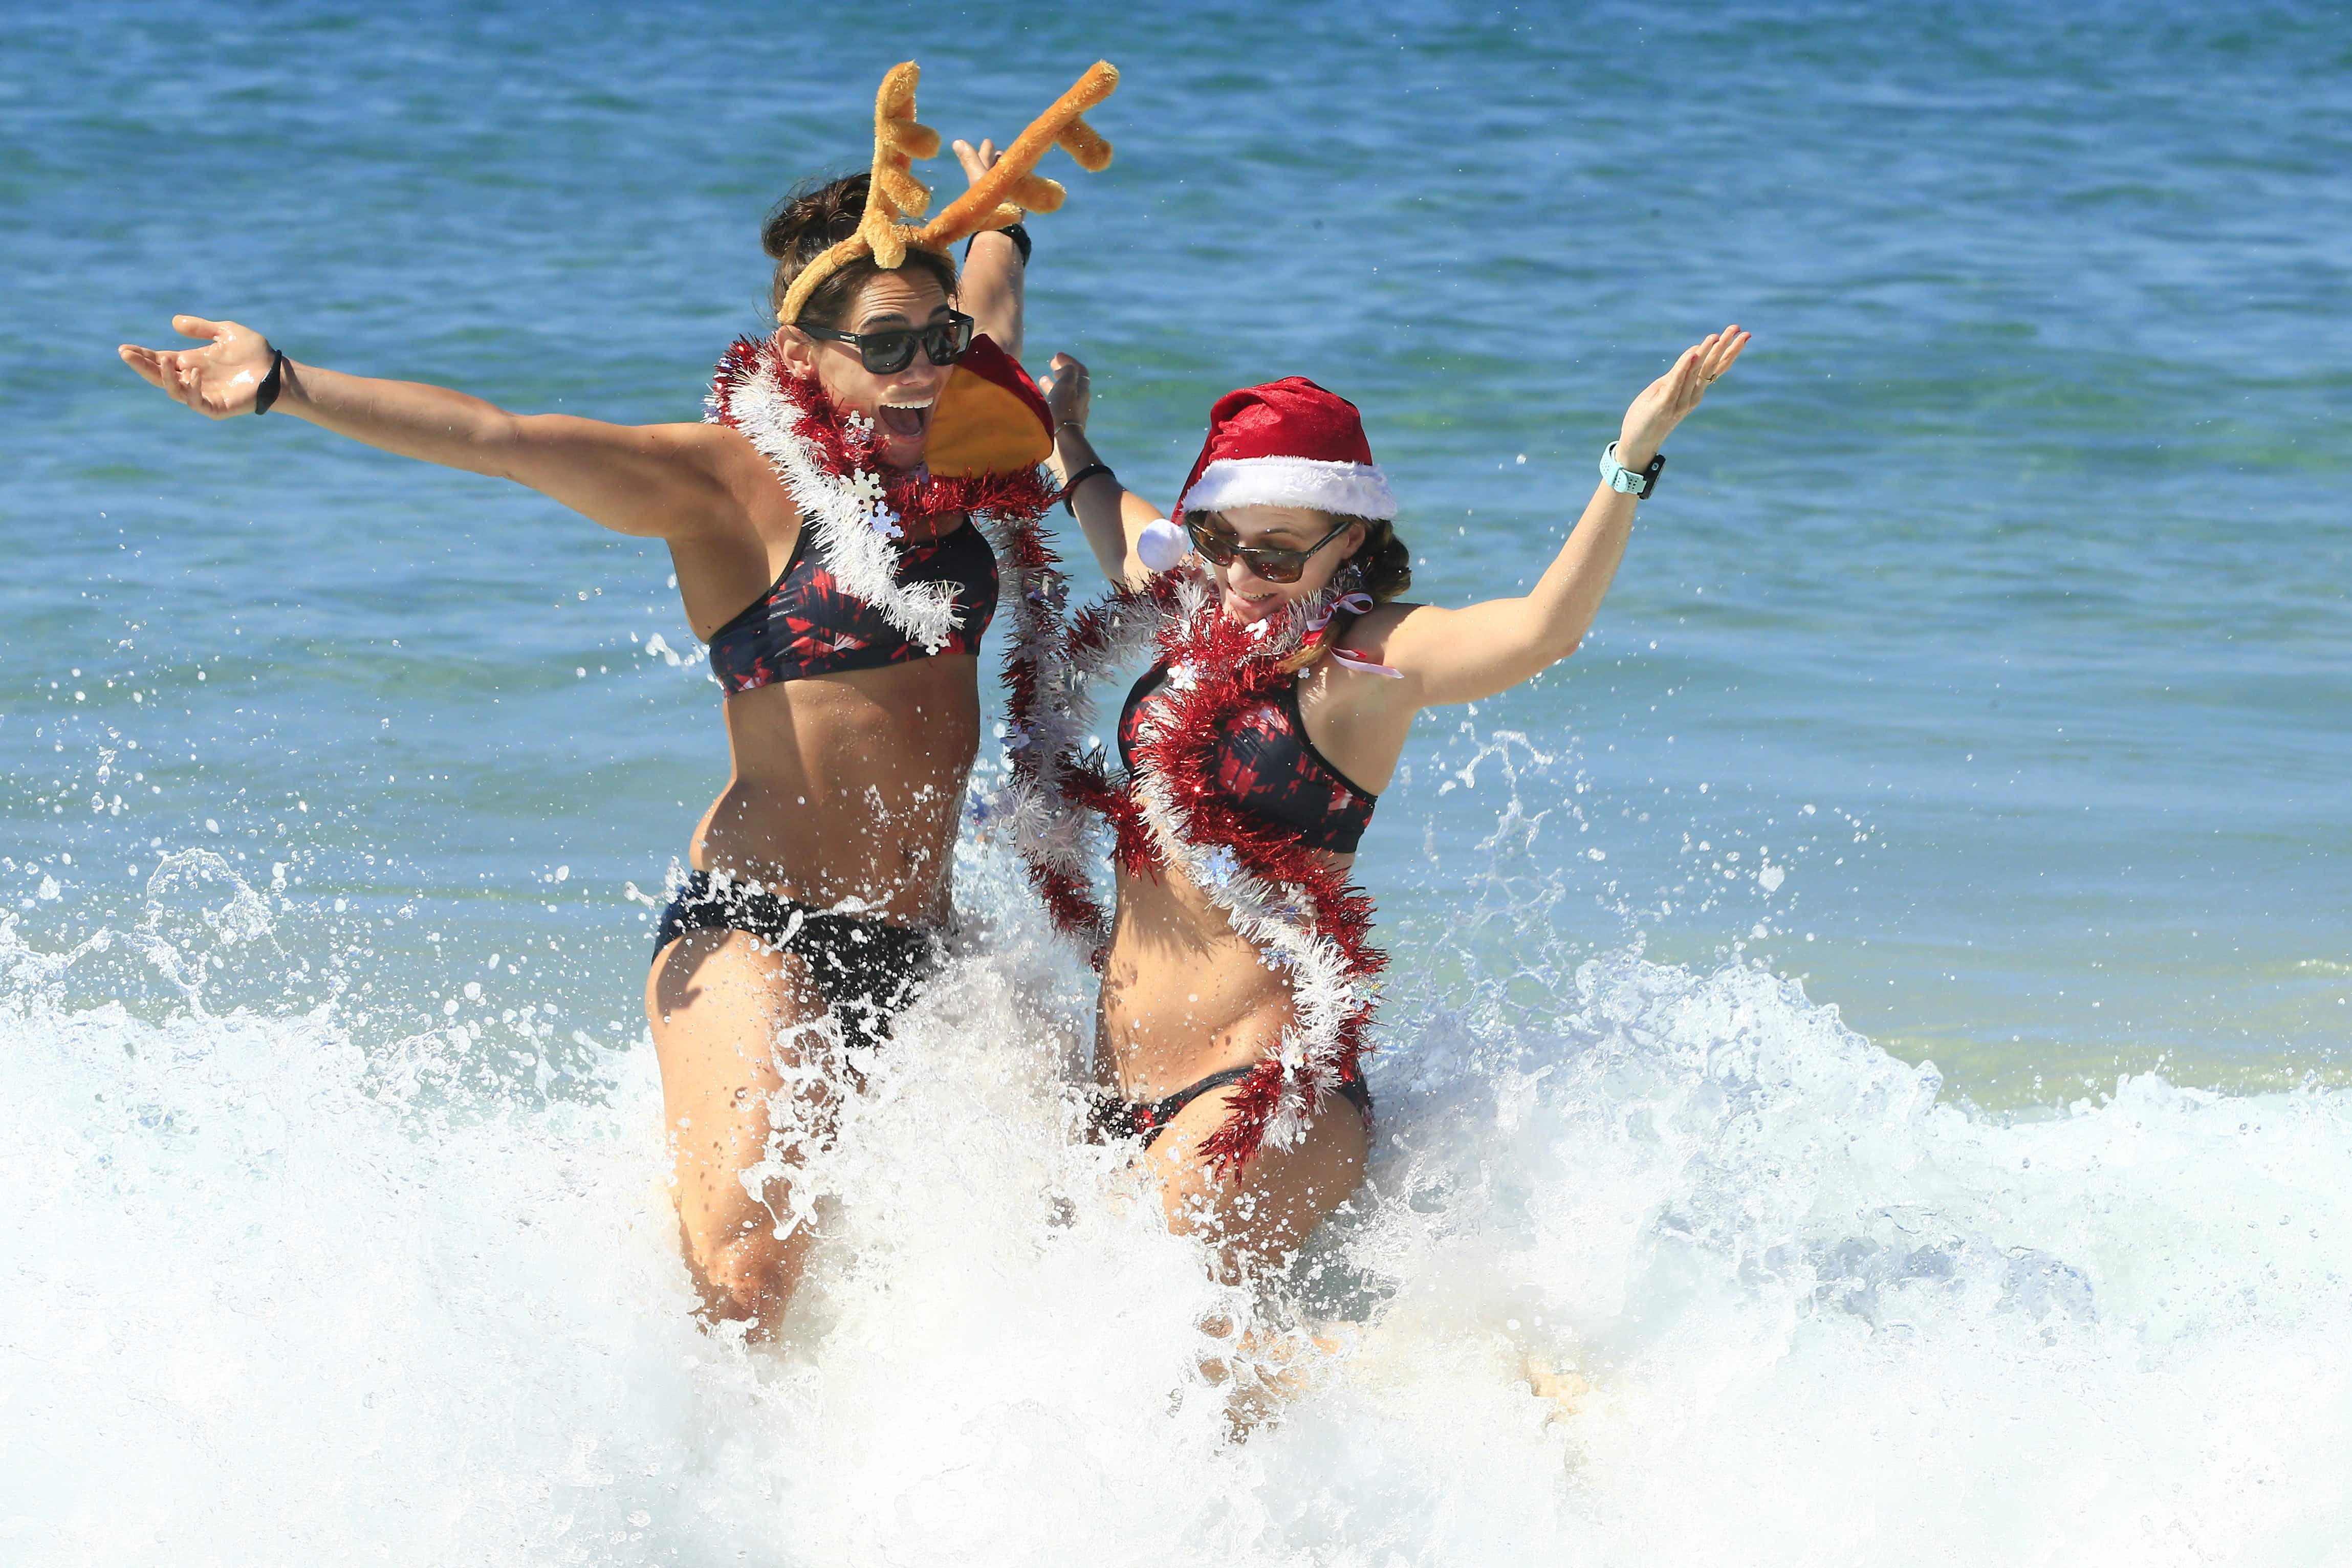 Festive holiday celebrations around the world